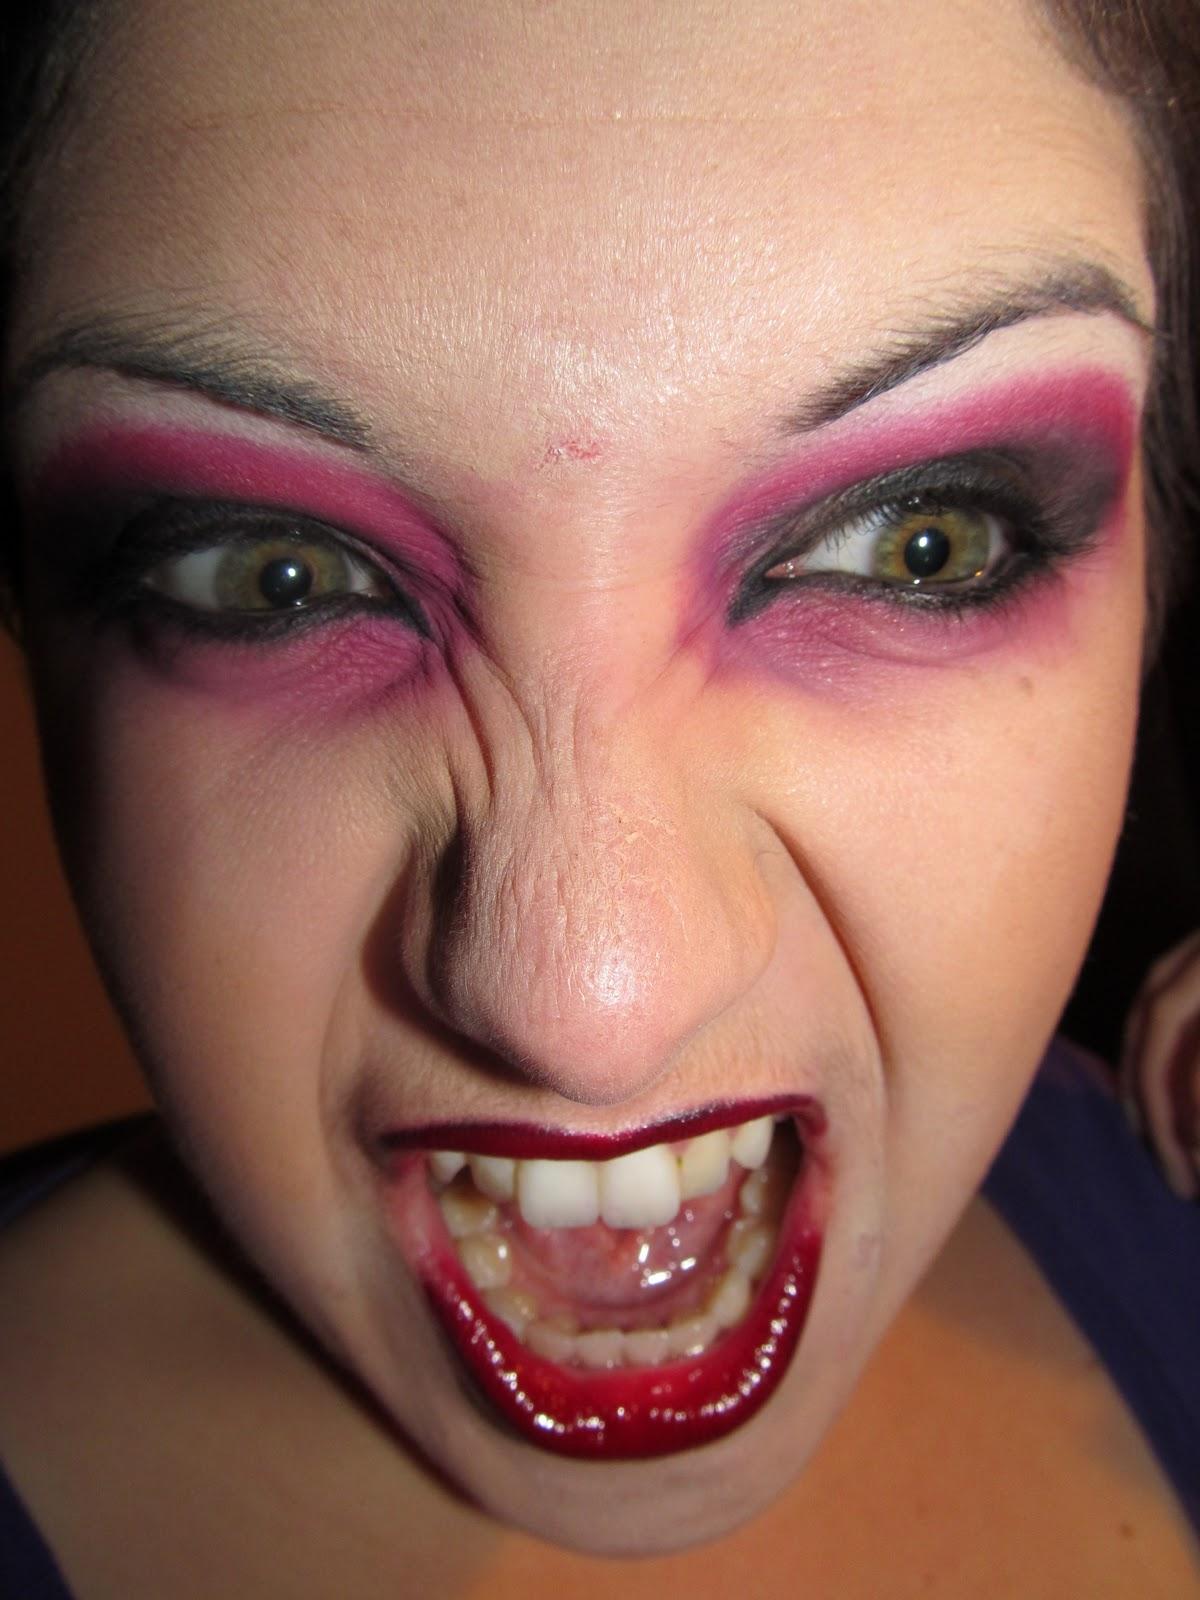 Kit maquillage halloween femme vampire vampire homme Halloween  Deguise,toi, achat de Perruques